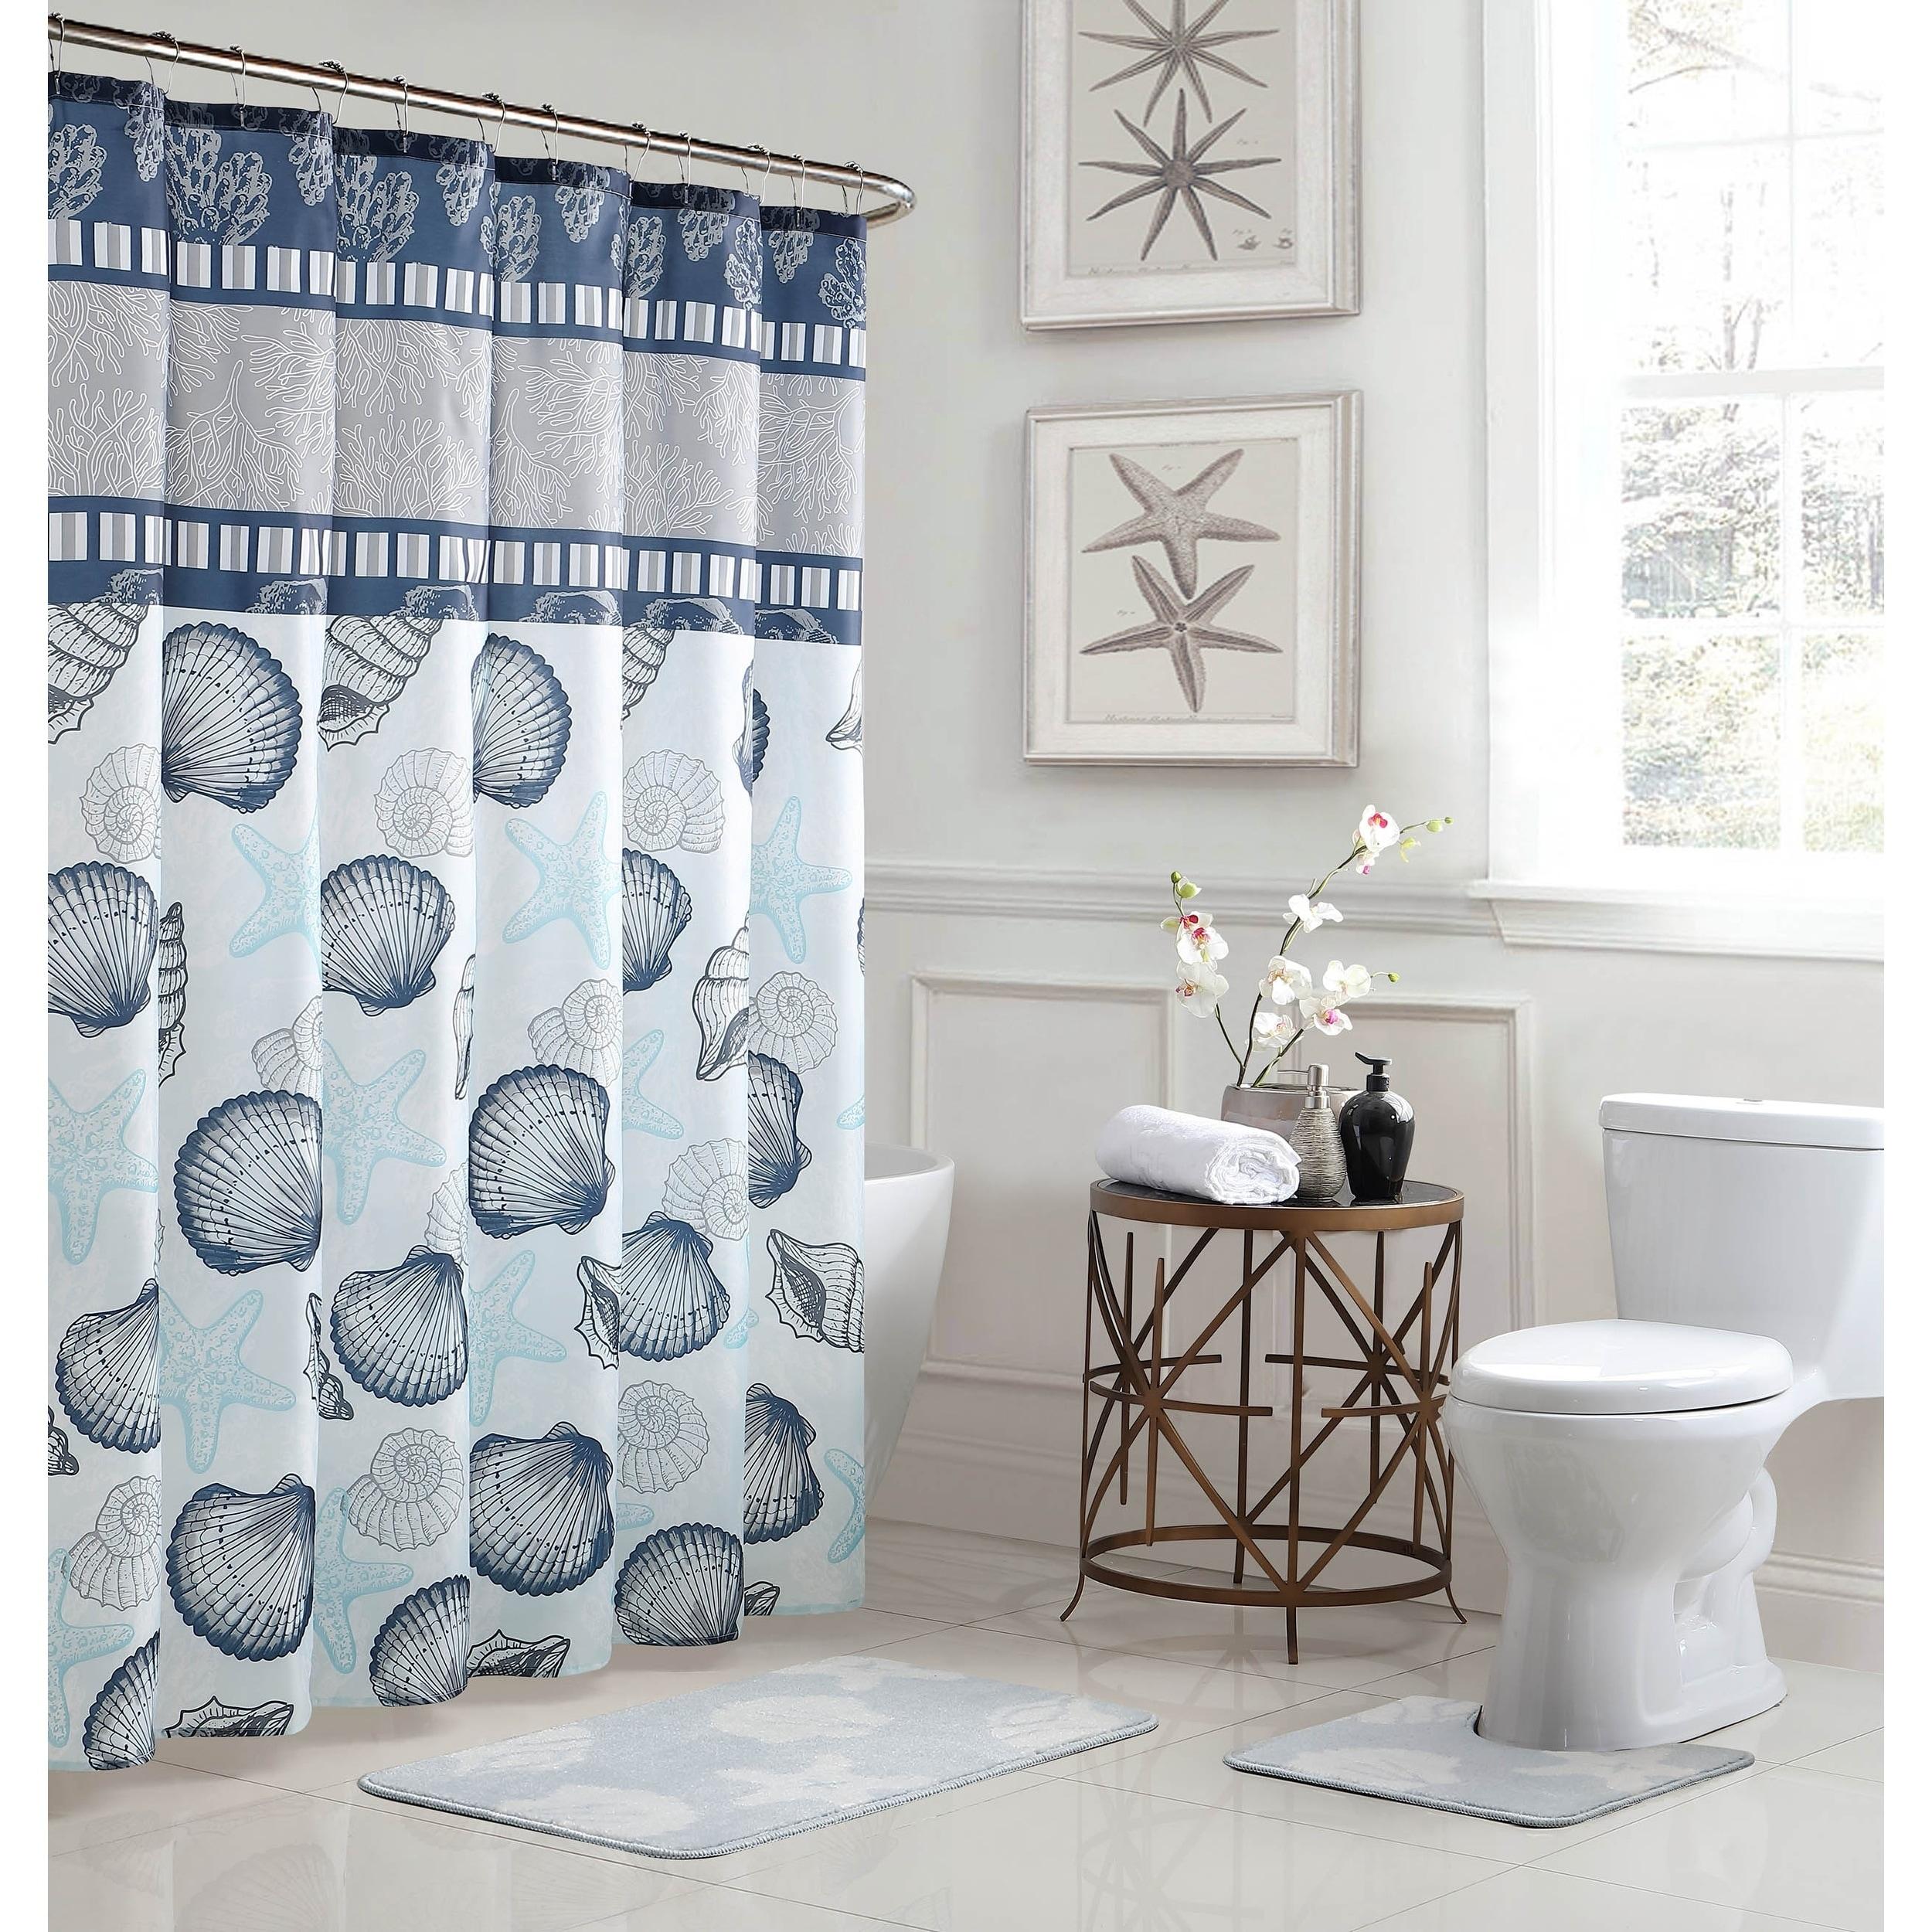 15 Piece Bathroom Shower Curtain Set